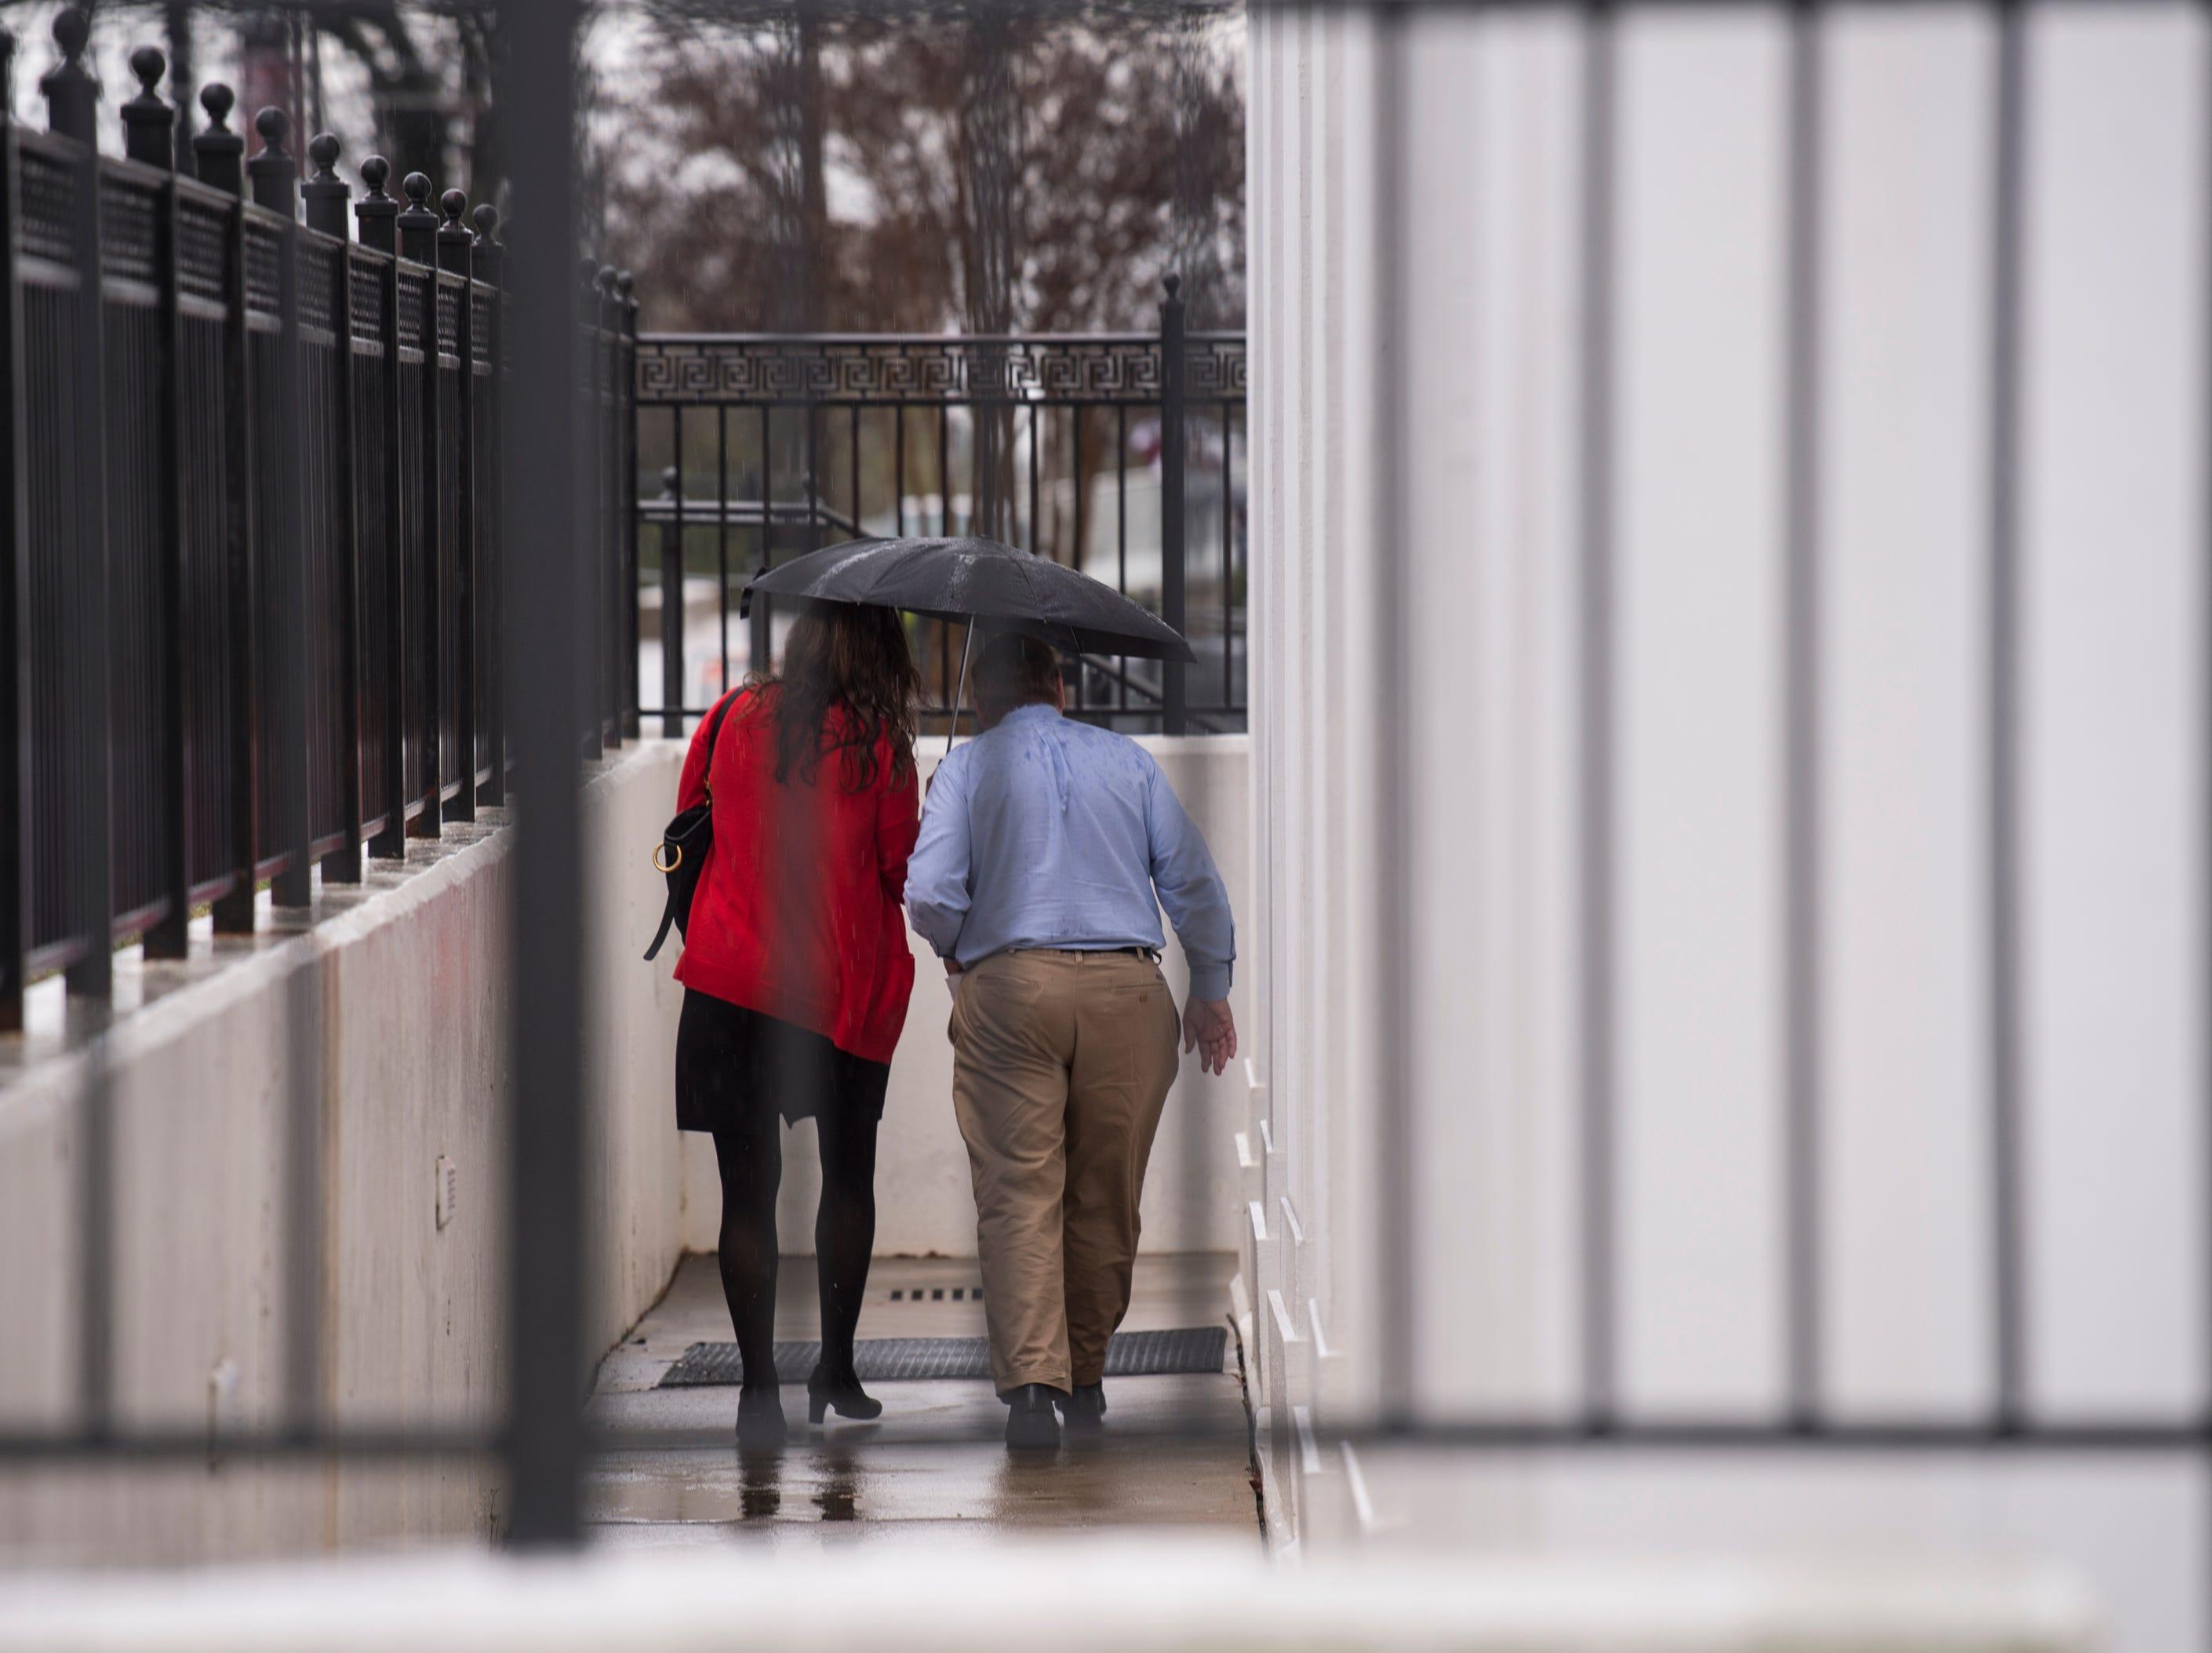 Pedestrians share an umbrella in Montgomery, Ala., on Tuesday, Feb. 12, 2019.